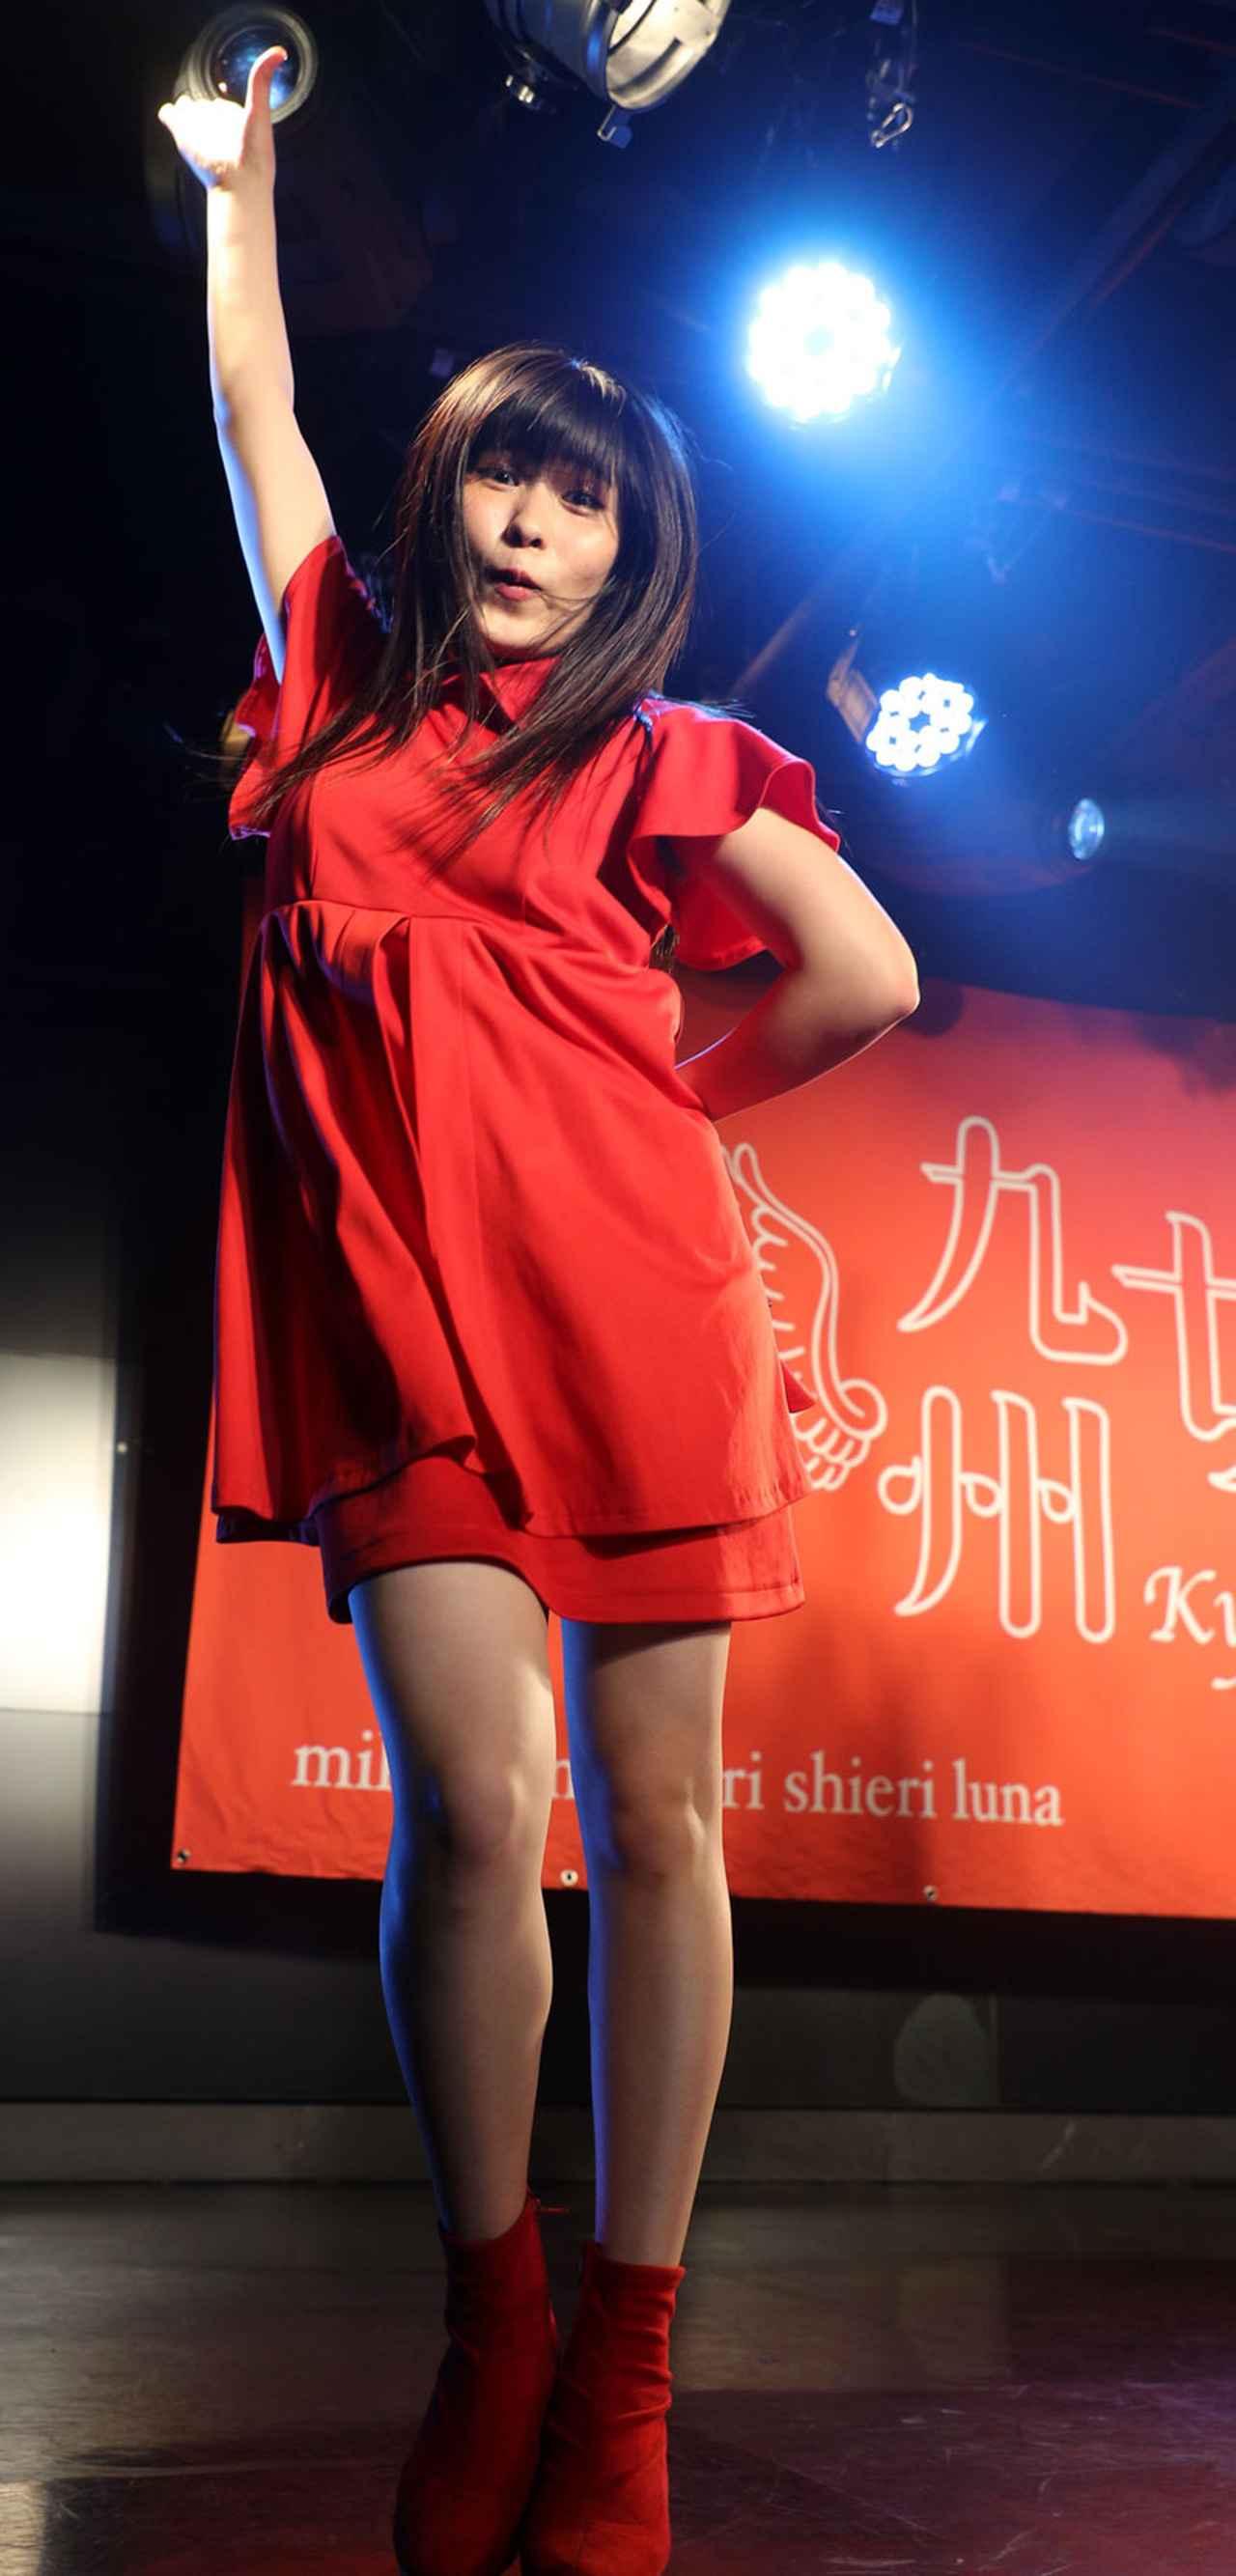 Images : 9番目の画像 - 「九州女子翼/TIF初出場を含め、今回の東京遠征で一回り大きくなった姿をアキカルの定期で披露」のアルバム - Stereo Sound ONLINE